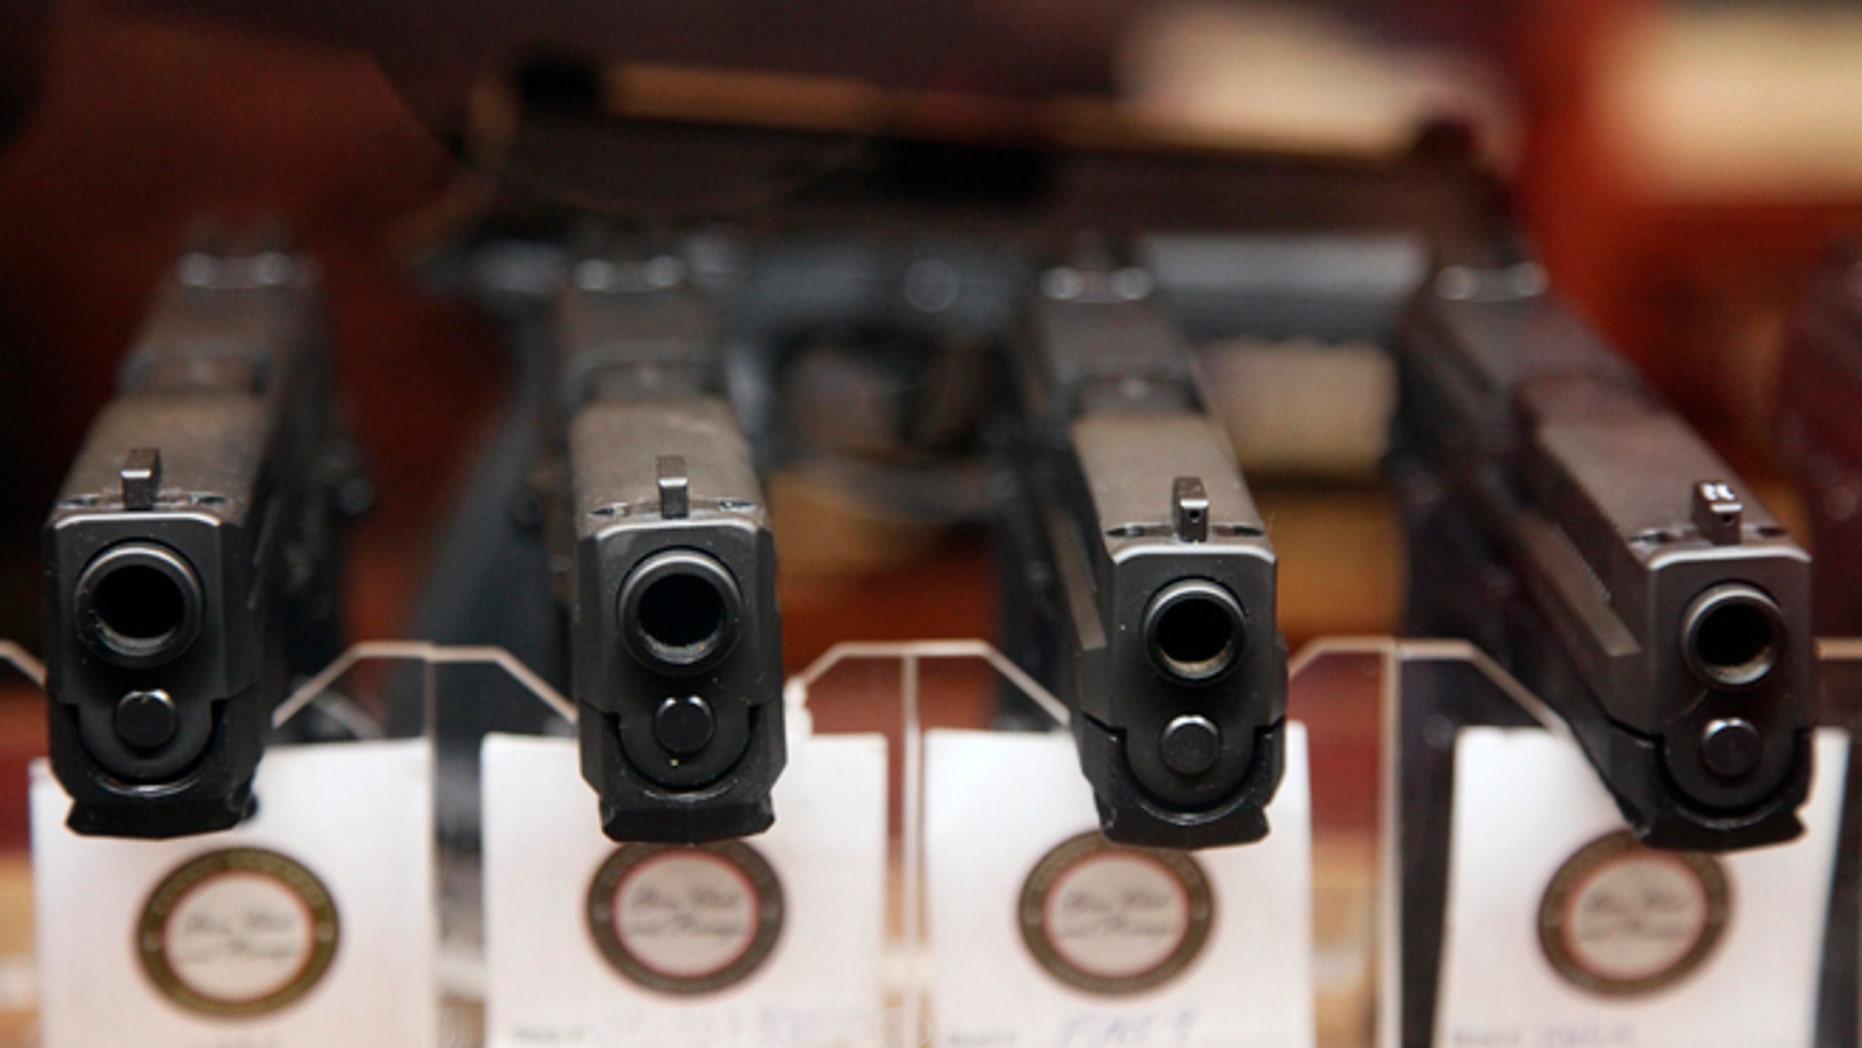 FILE: Handguns are displayed.